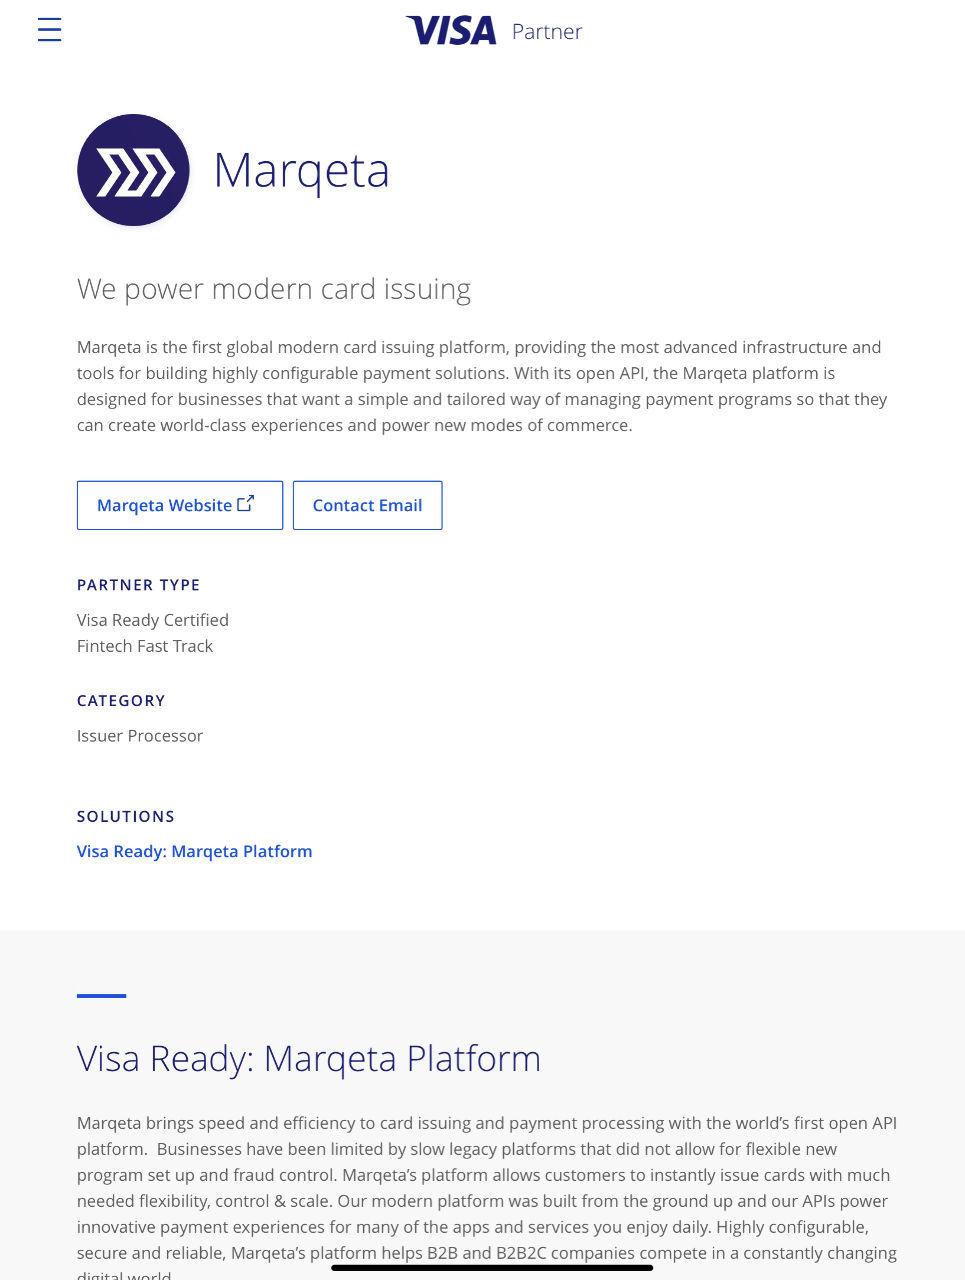 V - ビザ Visa Ready: Marqeta Platform